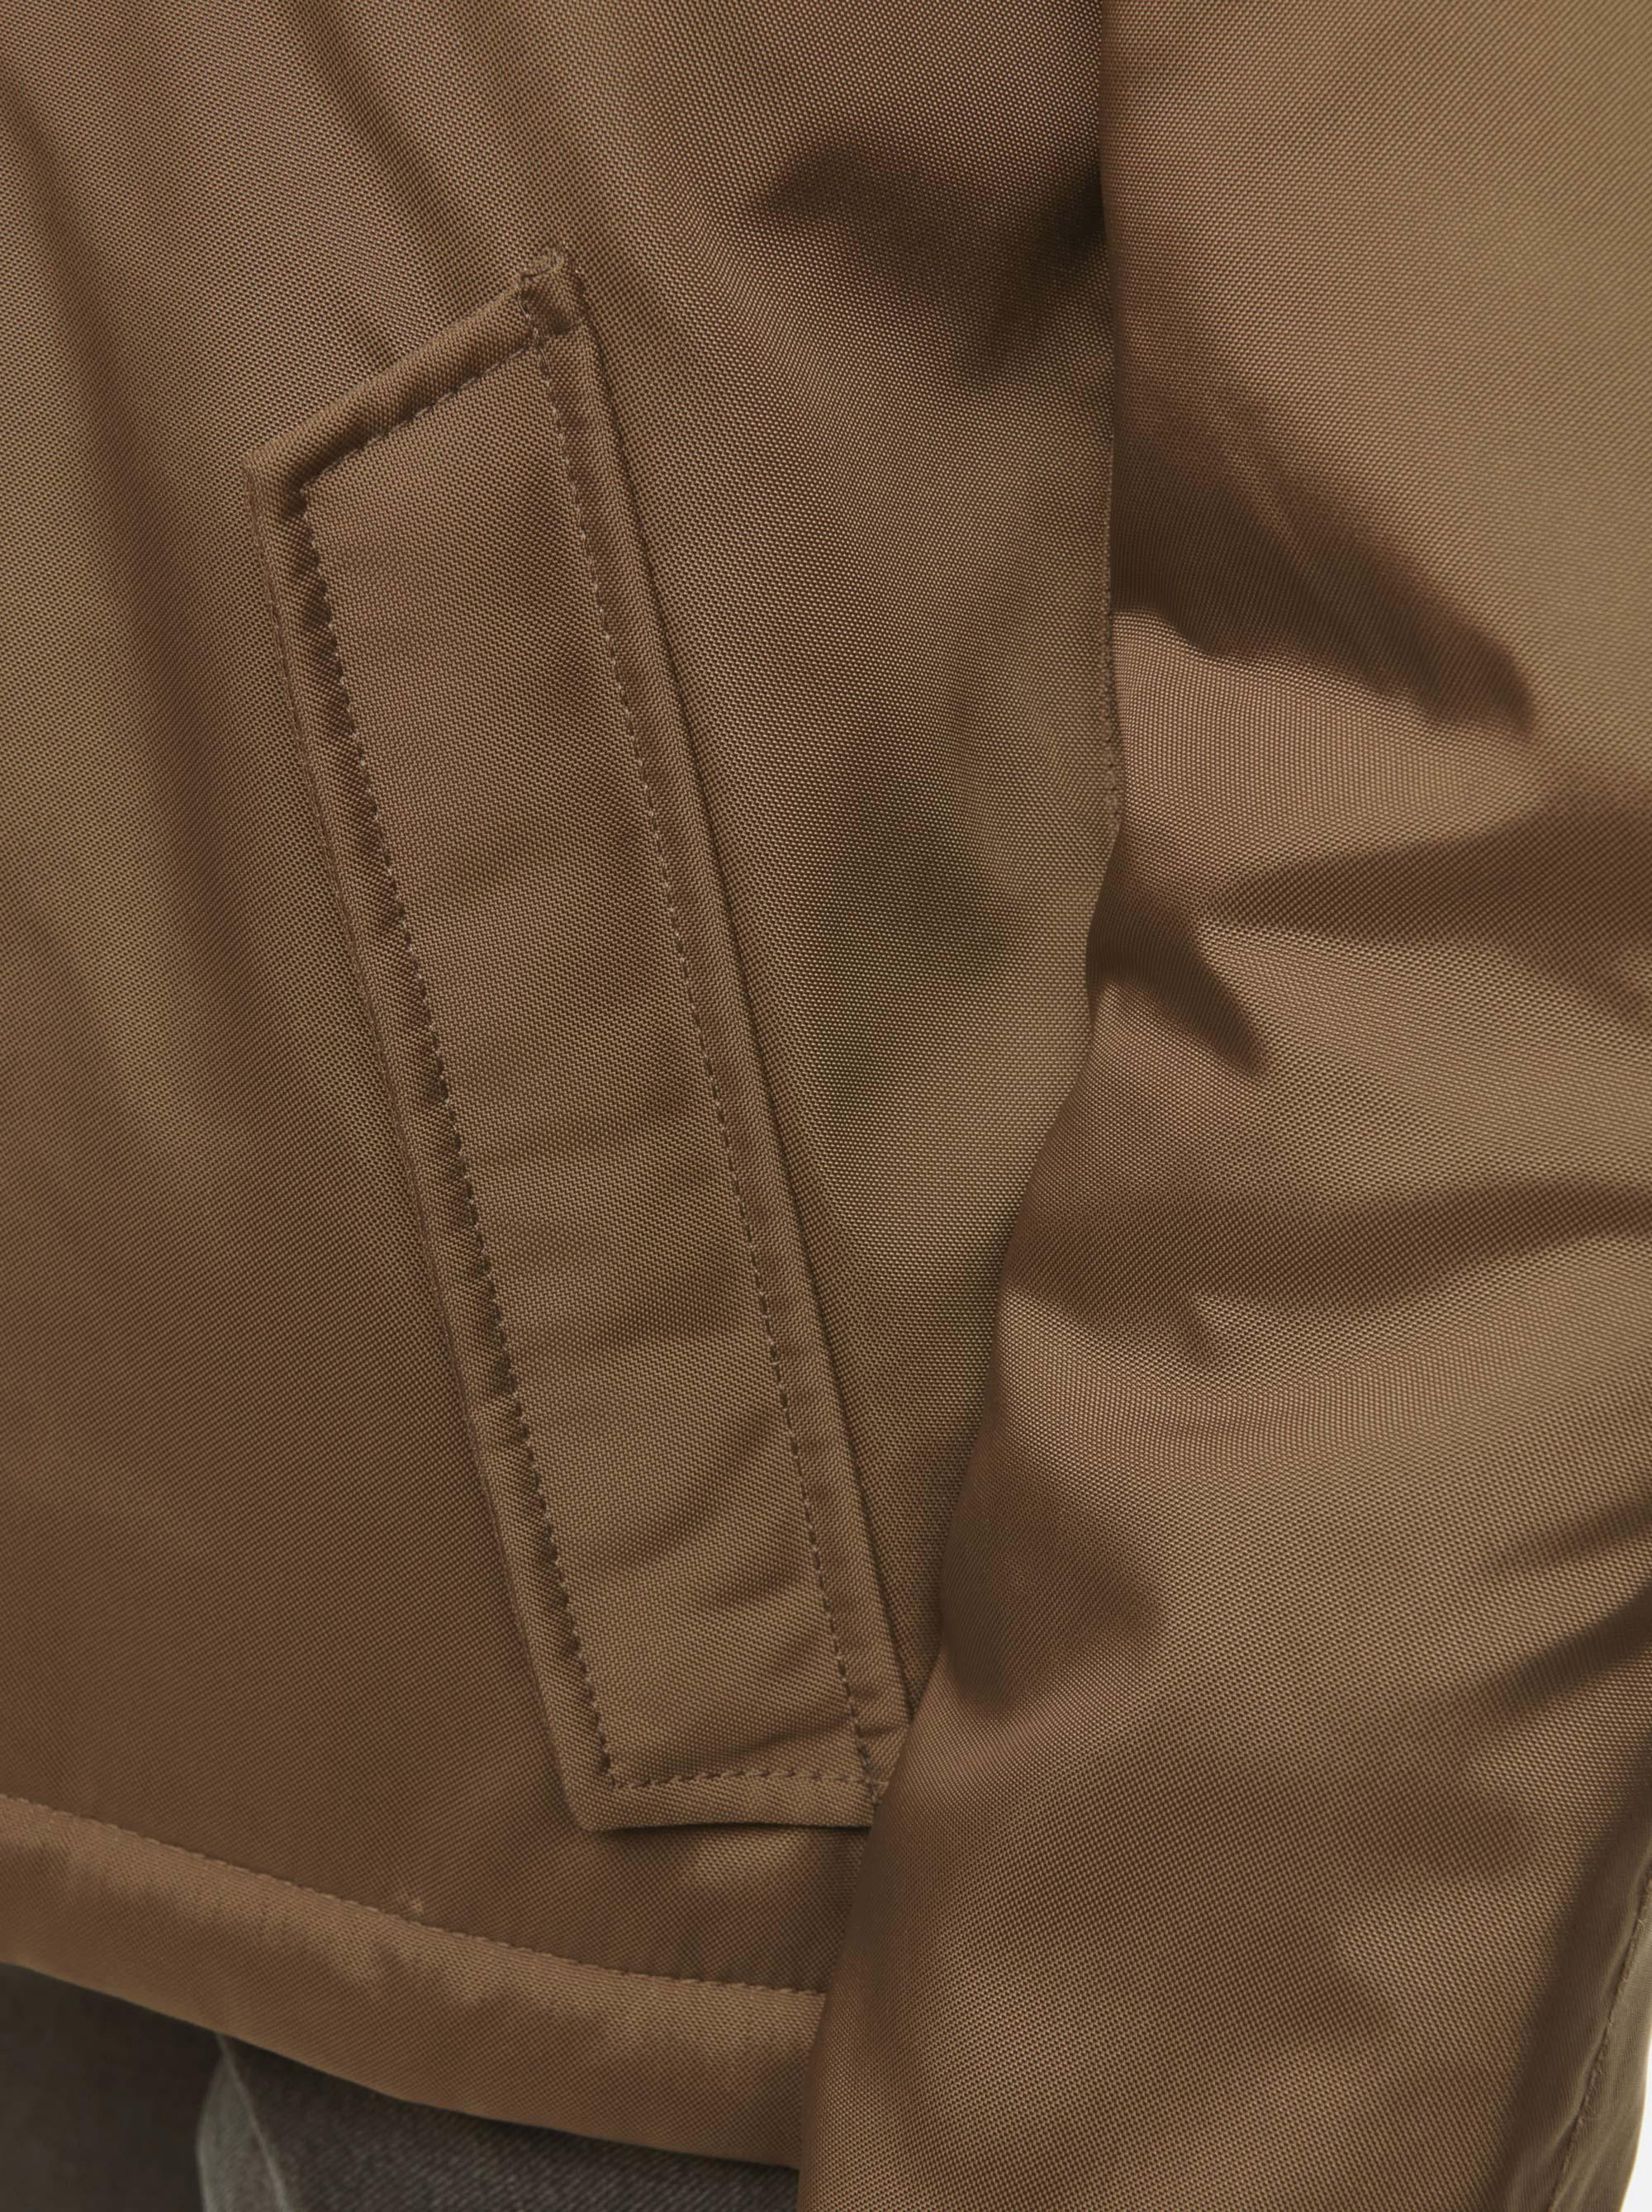 Teym - The Parka - Women - Brown - Short - Detail - 5